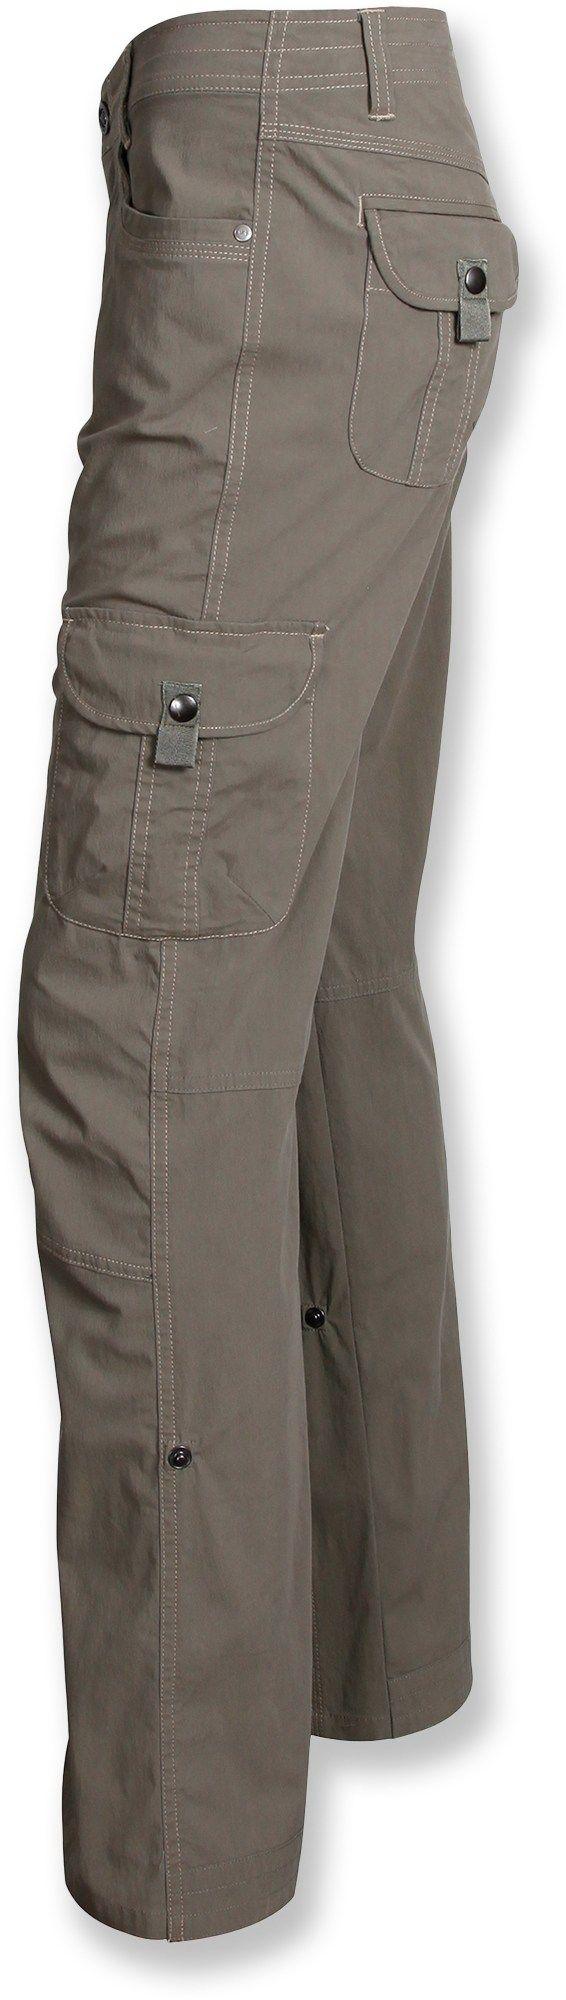 Kuhl Splash Roll-Up Pants - Women's - Free Shipping at REI.com